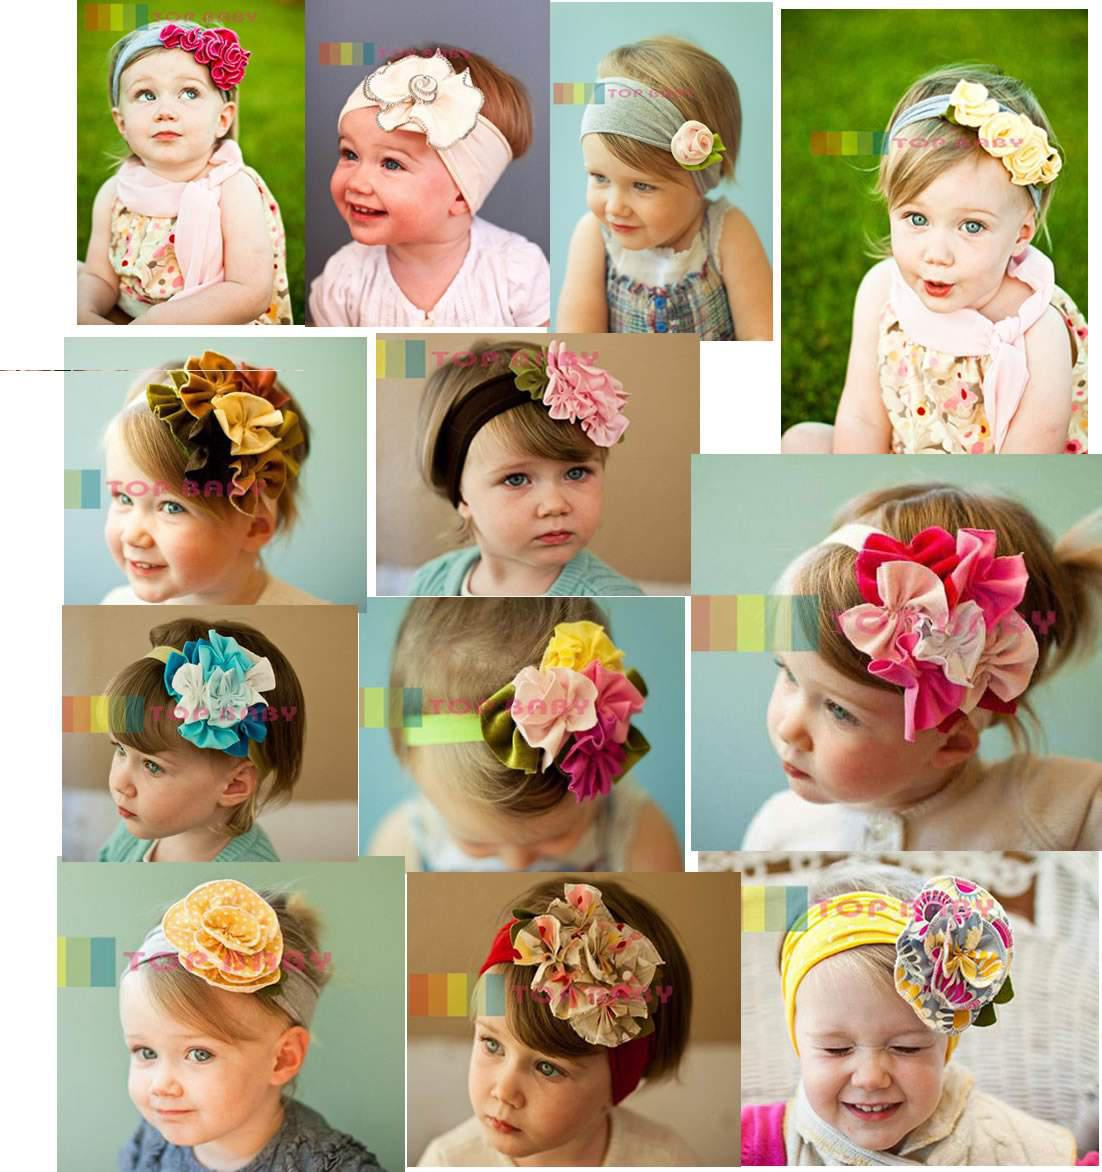 Be best hair accessories for baby - Top Baby Crochet Flower Hair Bow Clips Headband Barrette Caps Baby Headdress Hoody Flower Hair